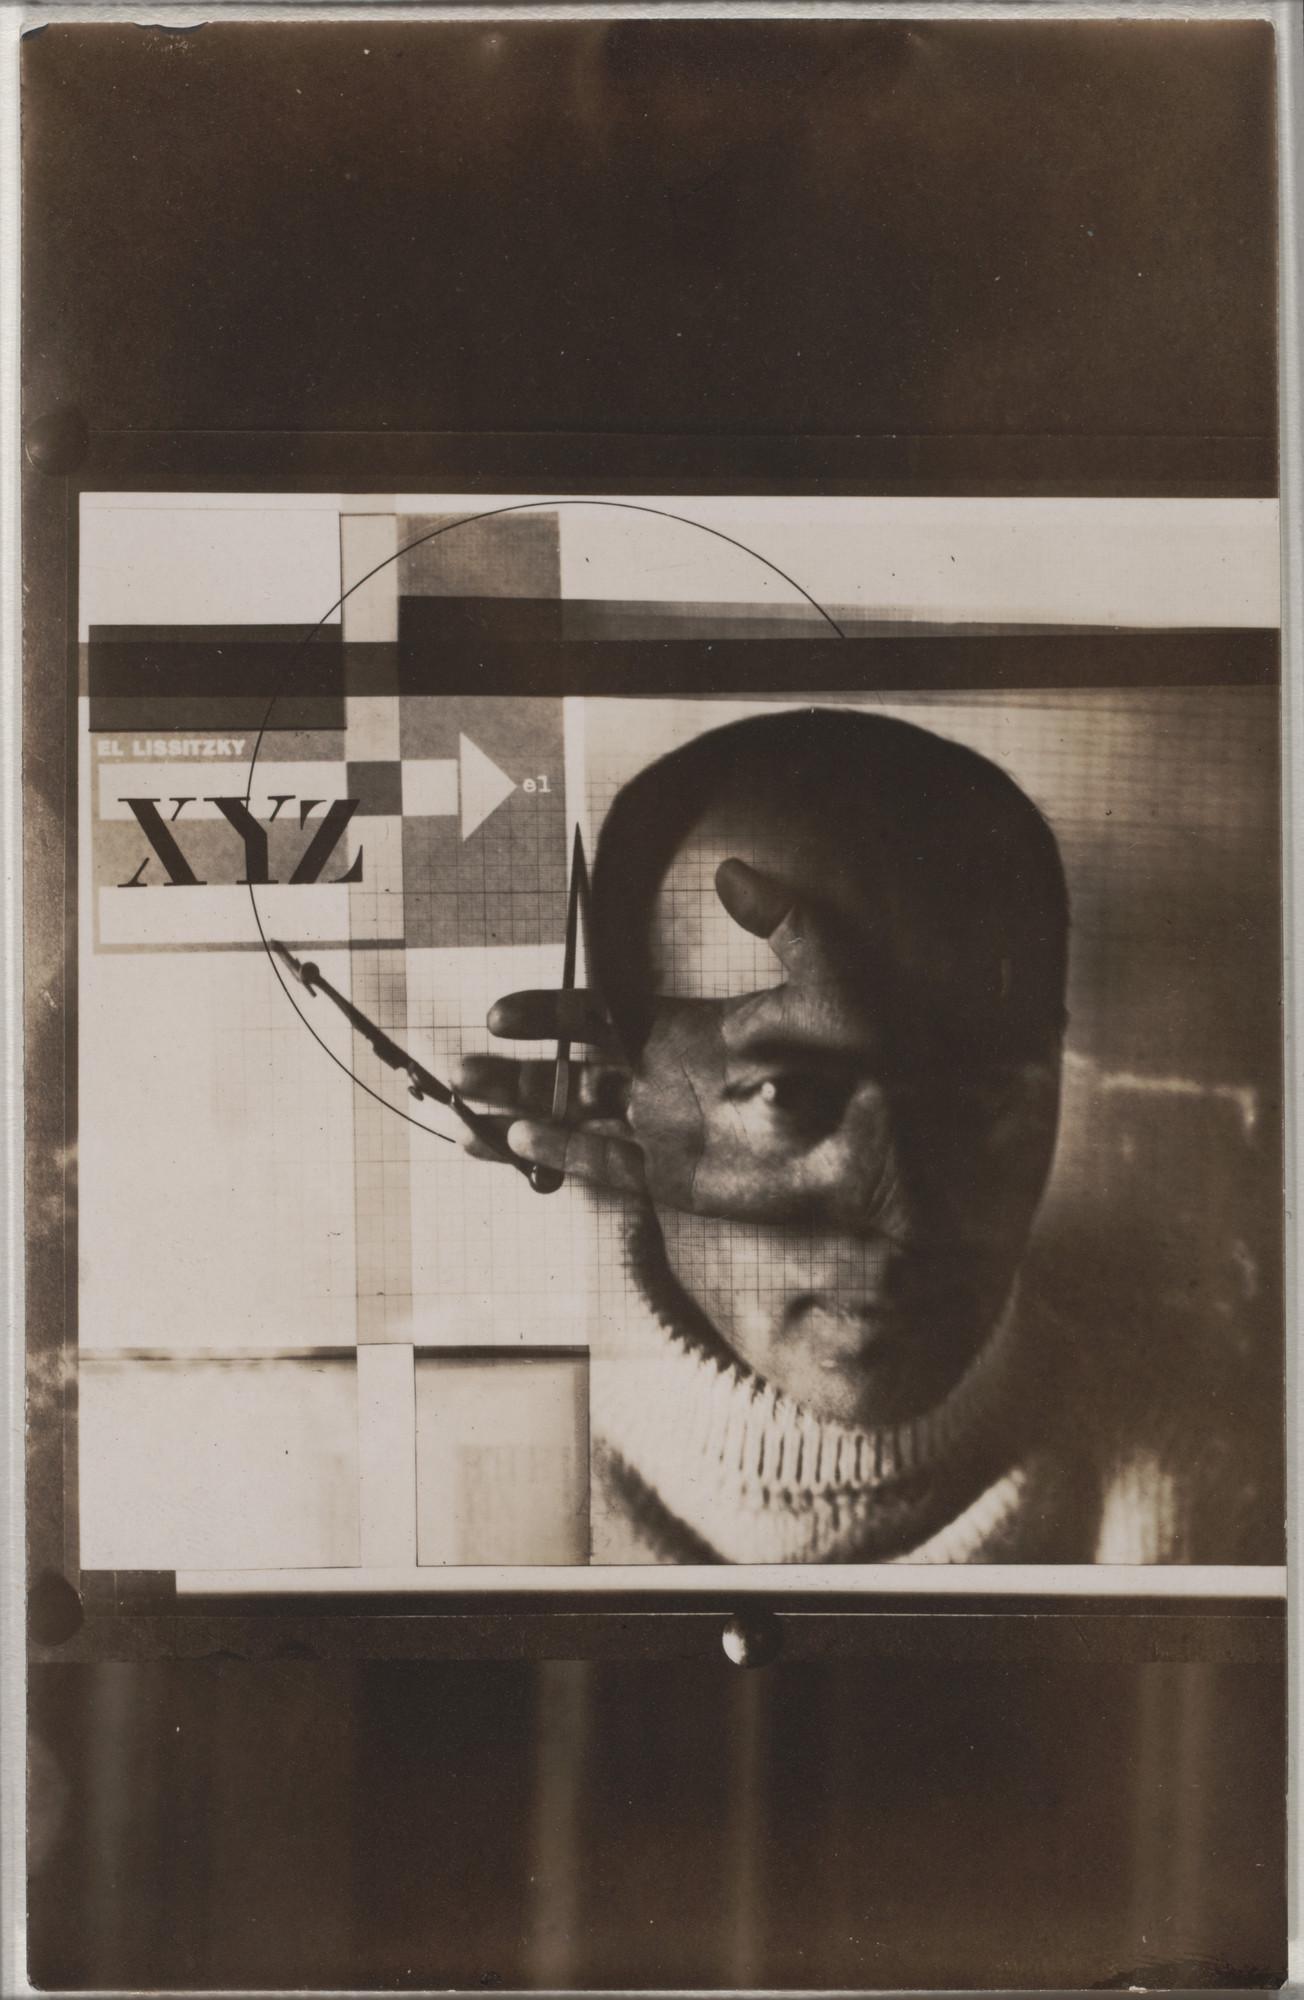 el lissitzky Solntse na izlete vtoraia kniga stikhov, 1913-1916 1916cover with letterpress illustration 184 × 23 cm (72 × 9 in) edition: 480.